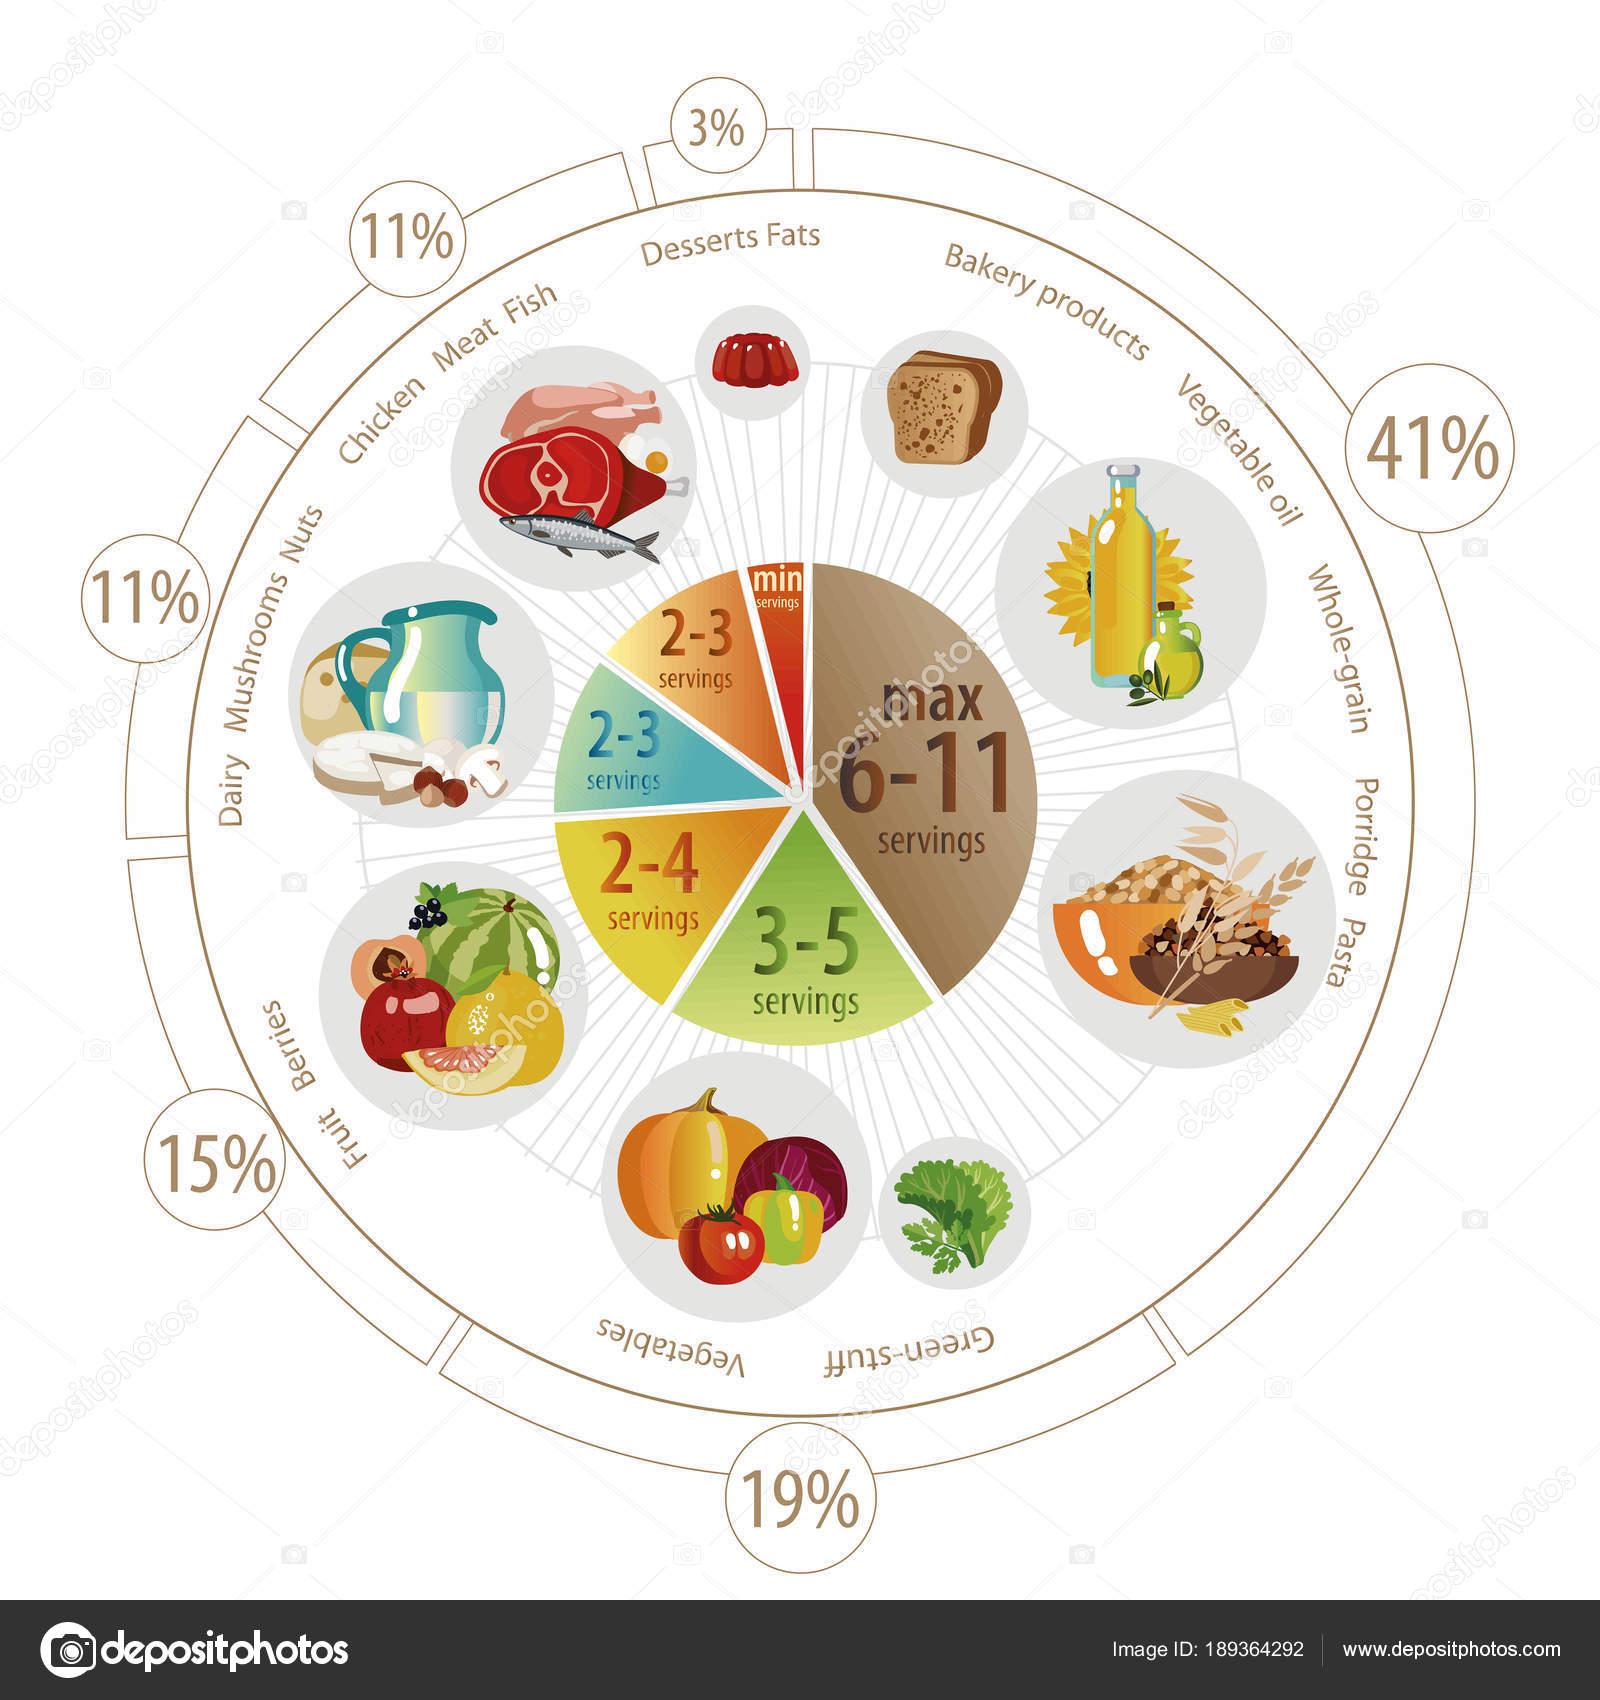 Food Pyramid Of Pie Chart Stock Vector Alfaolga 189364292